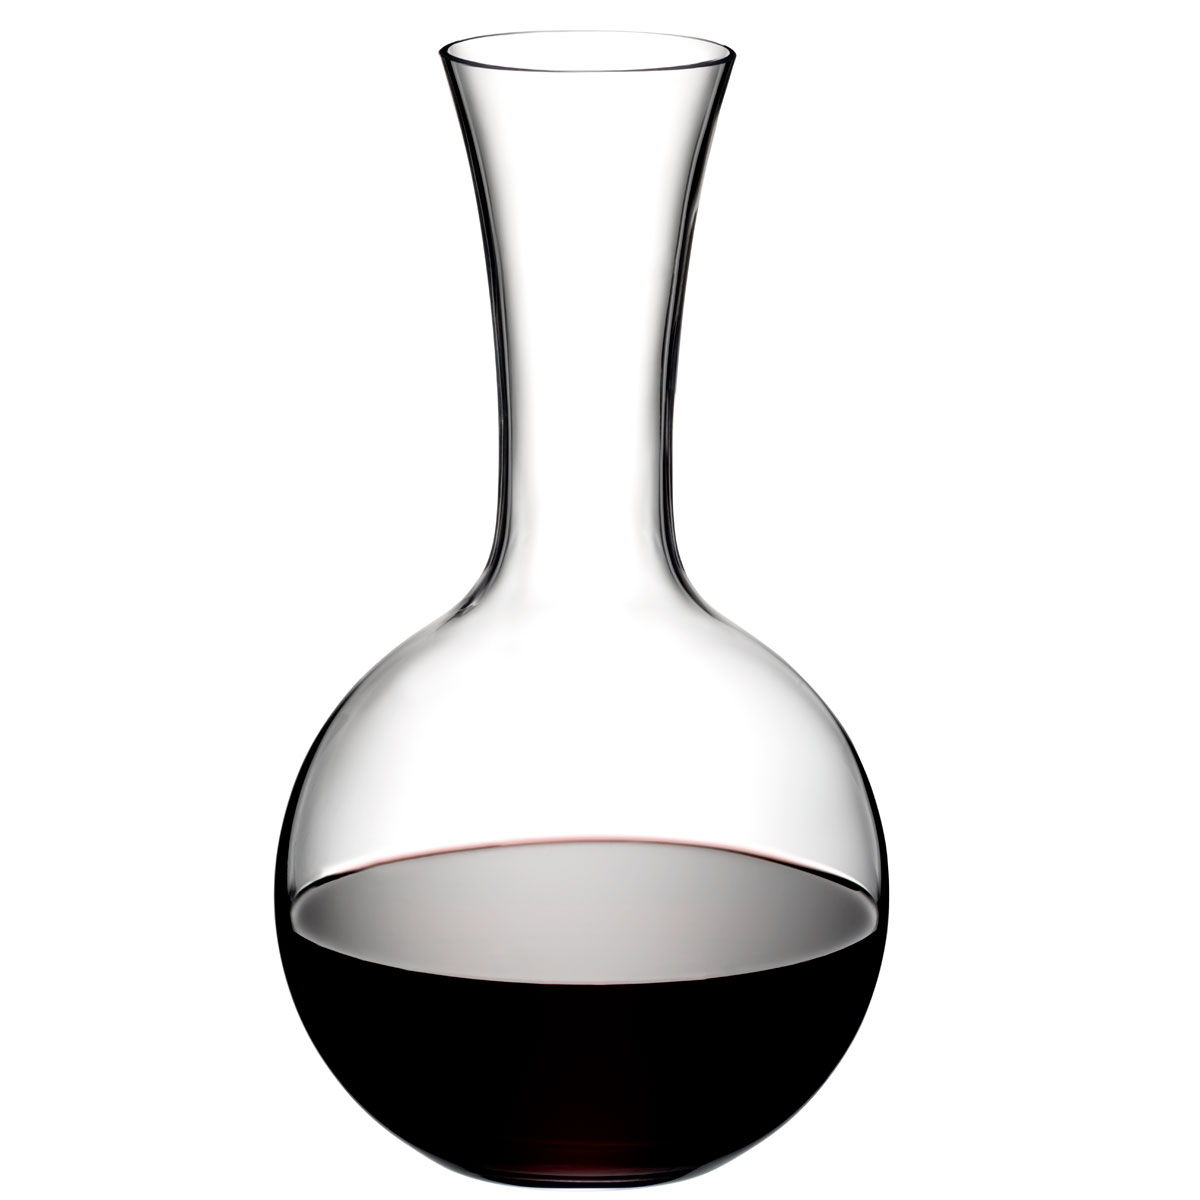 Riedel Syrah Magnum Wine Decanter